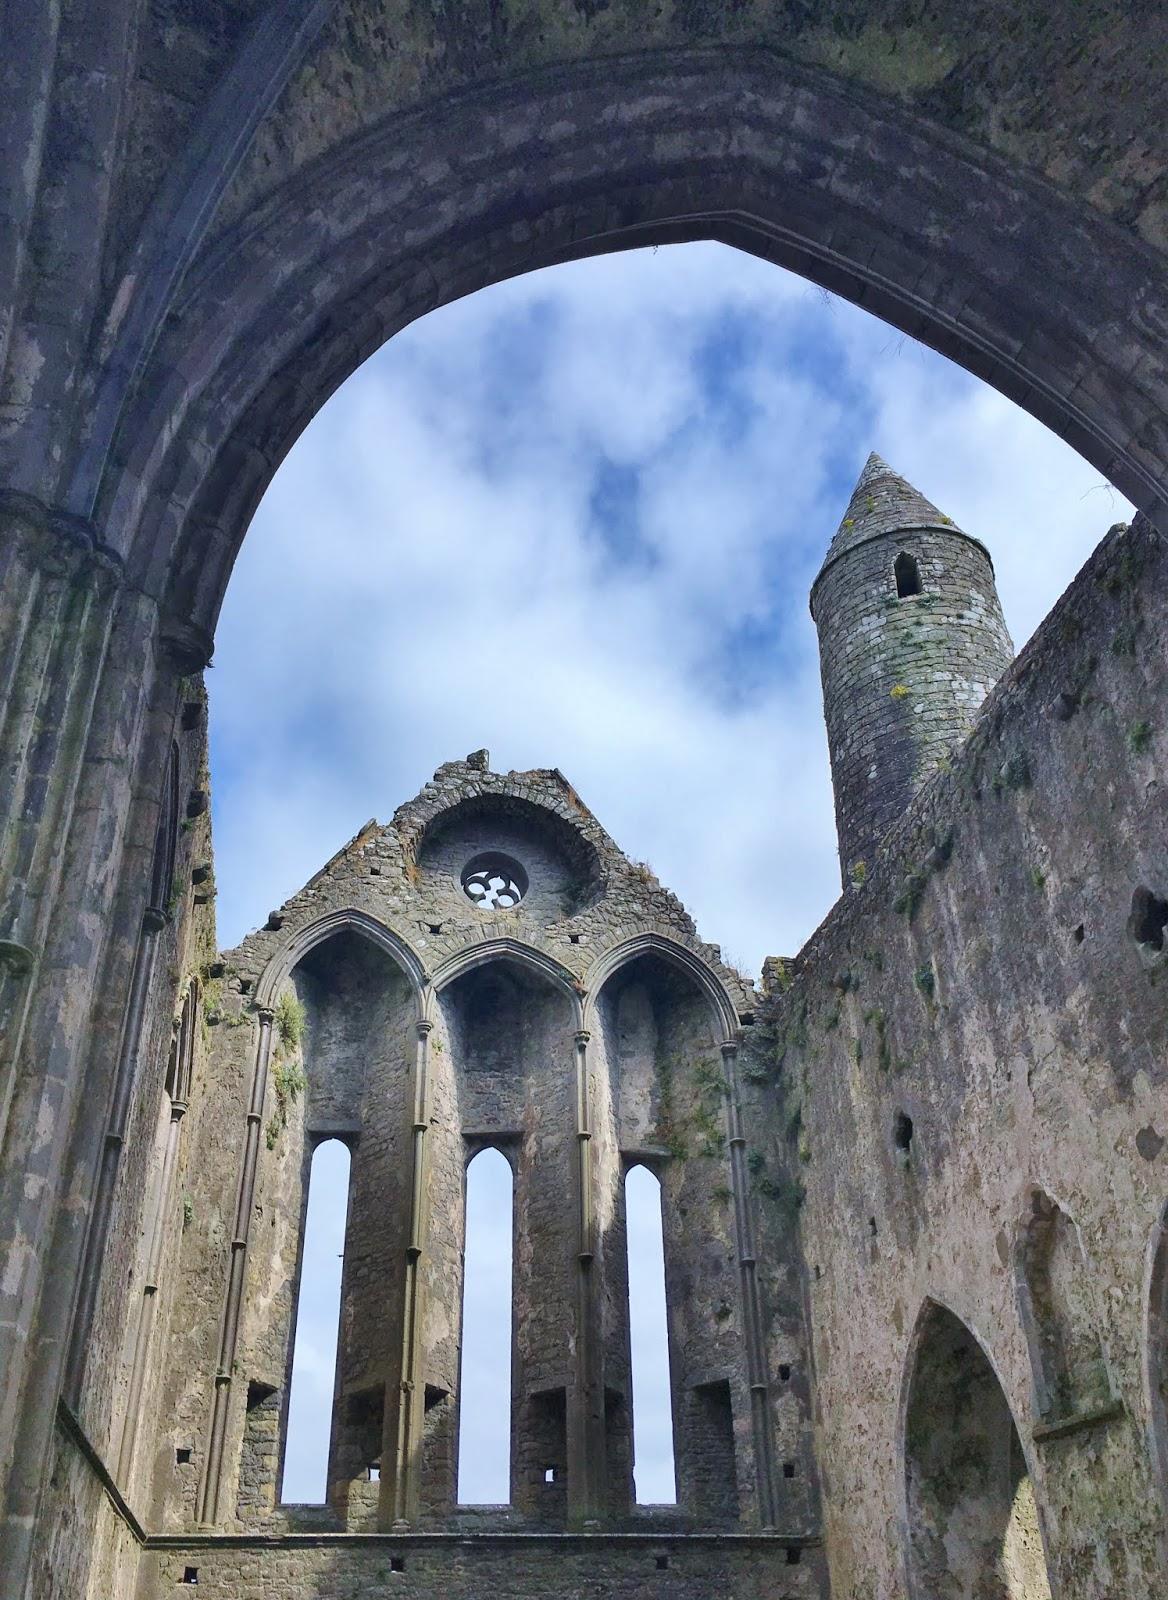 Cashel dating site - free online dating in Cashel (Ireland)